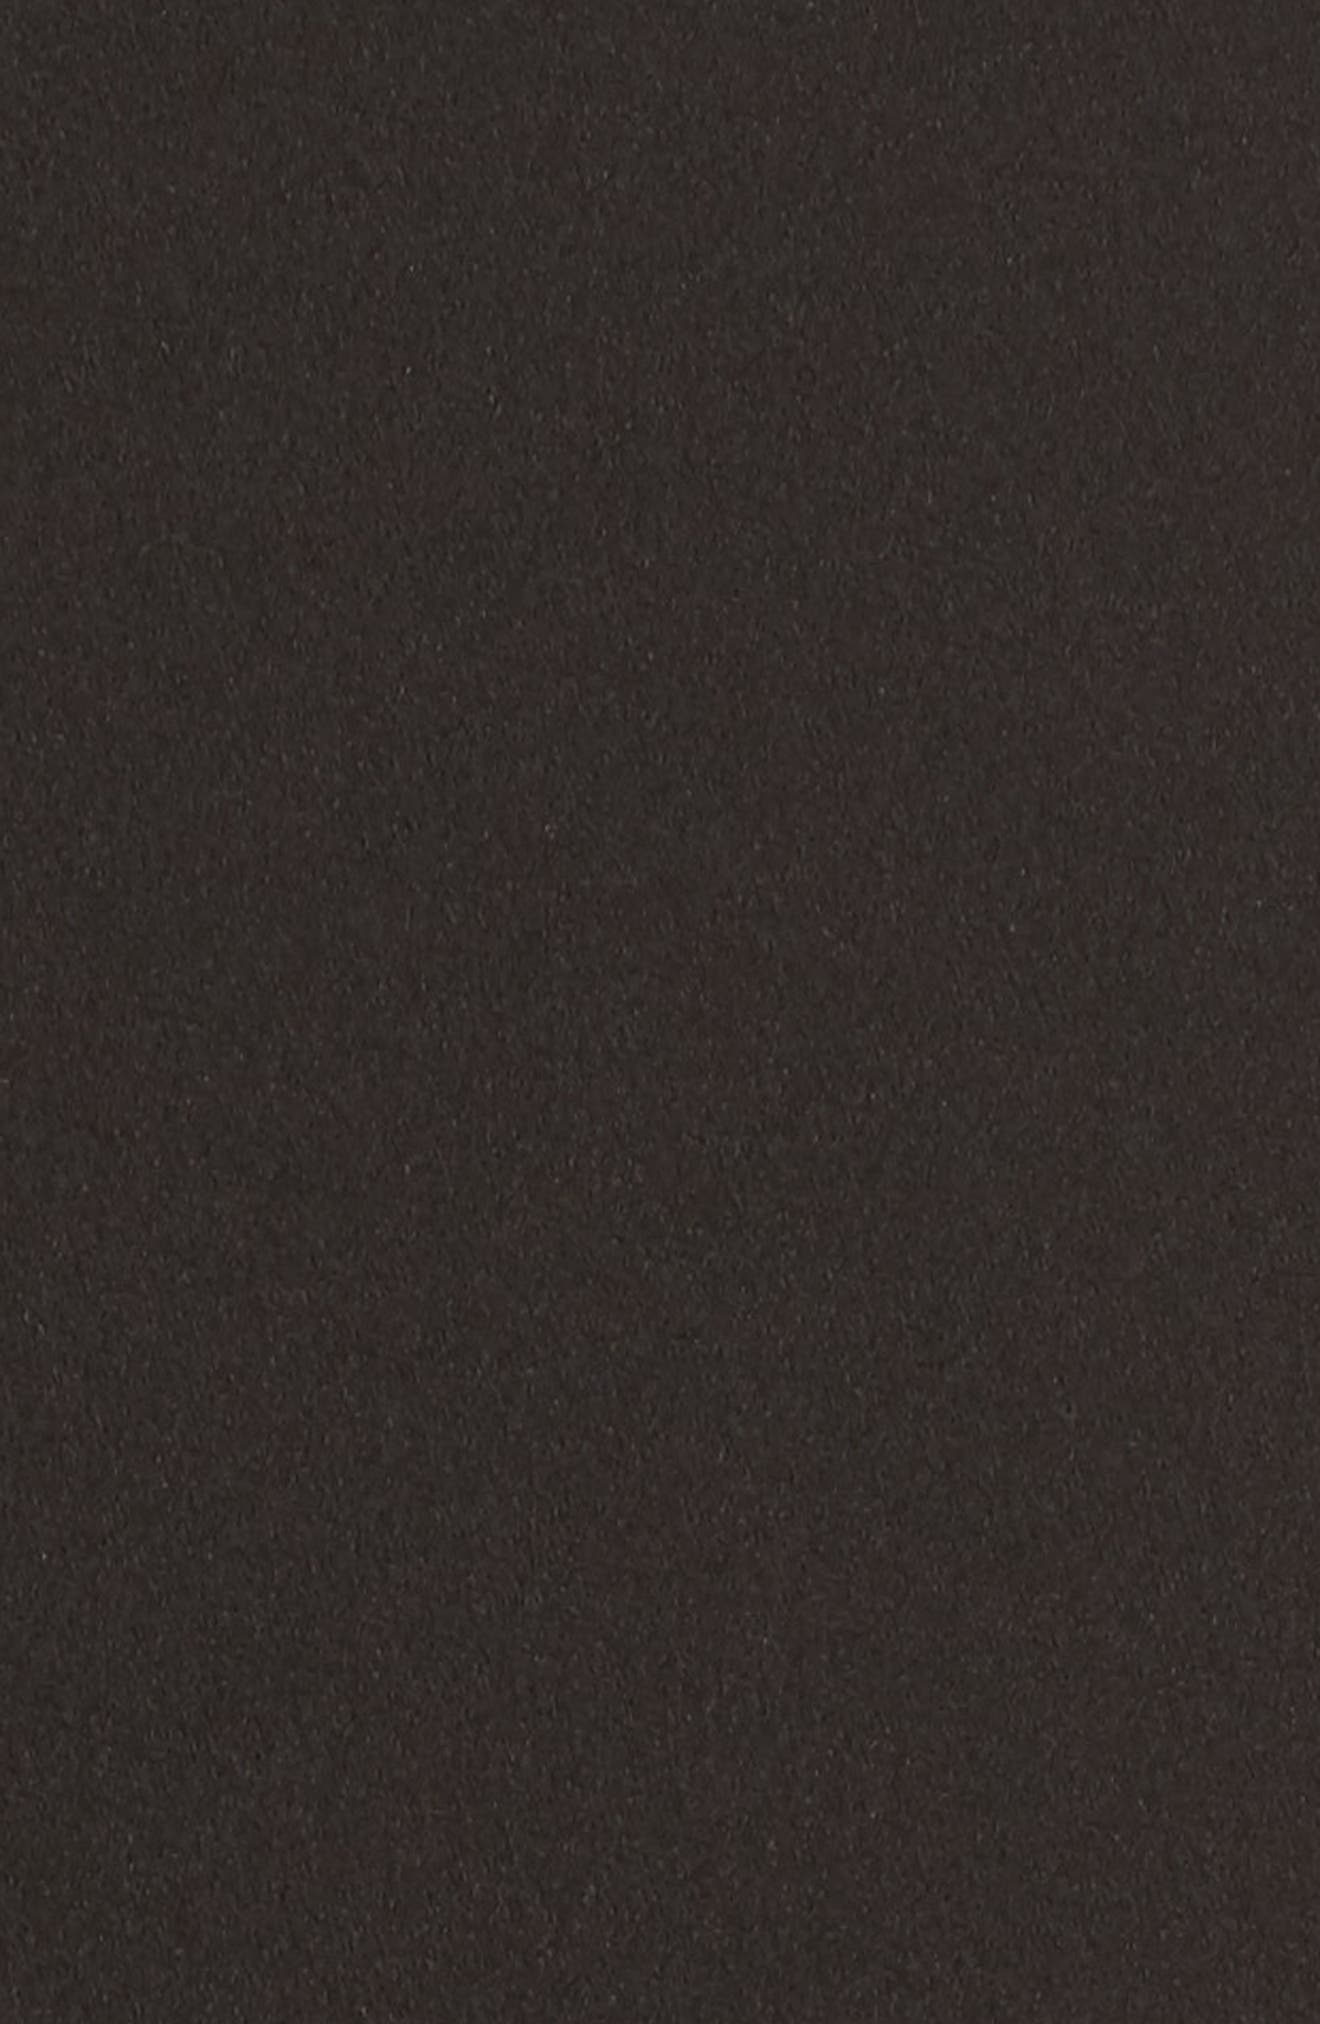 High Neck Sheath Dress,                             Alternate thumbnail 6, color,                             Black